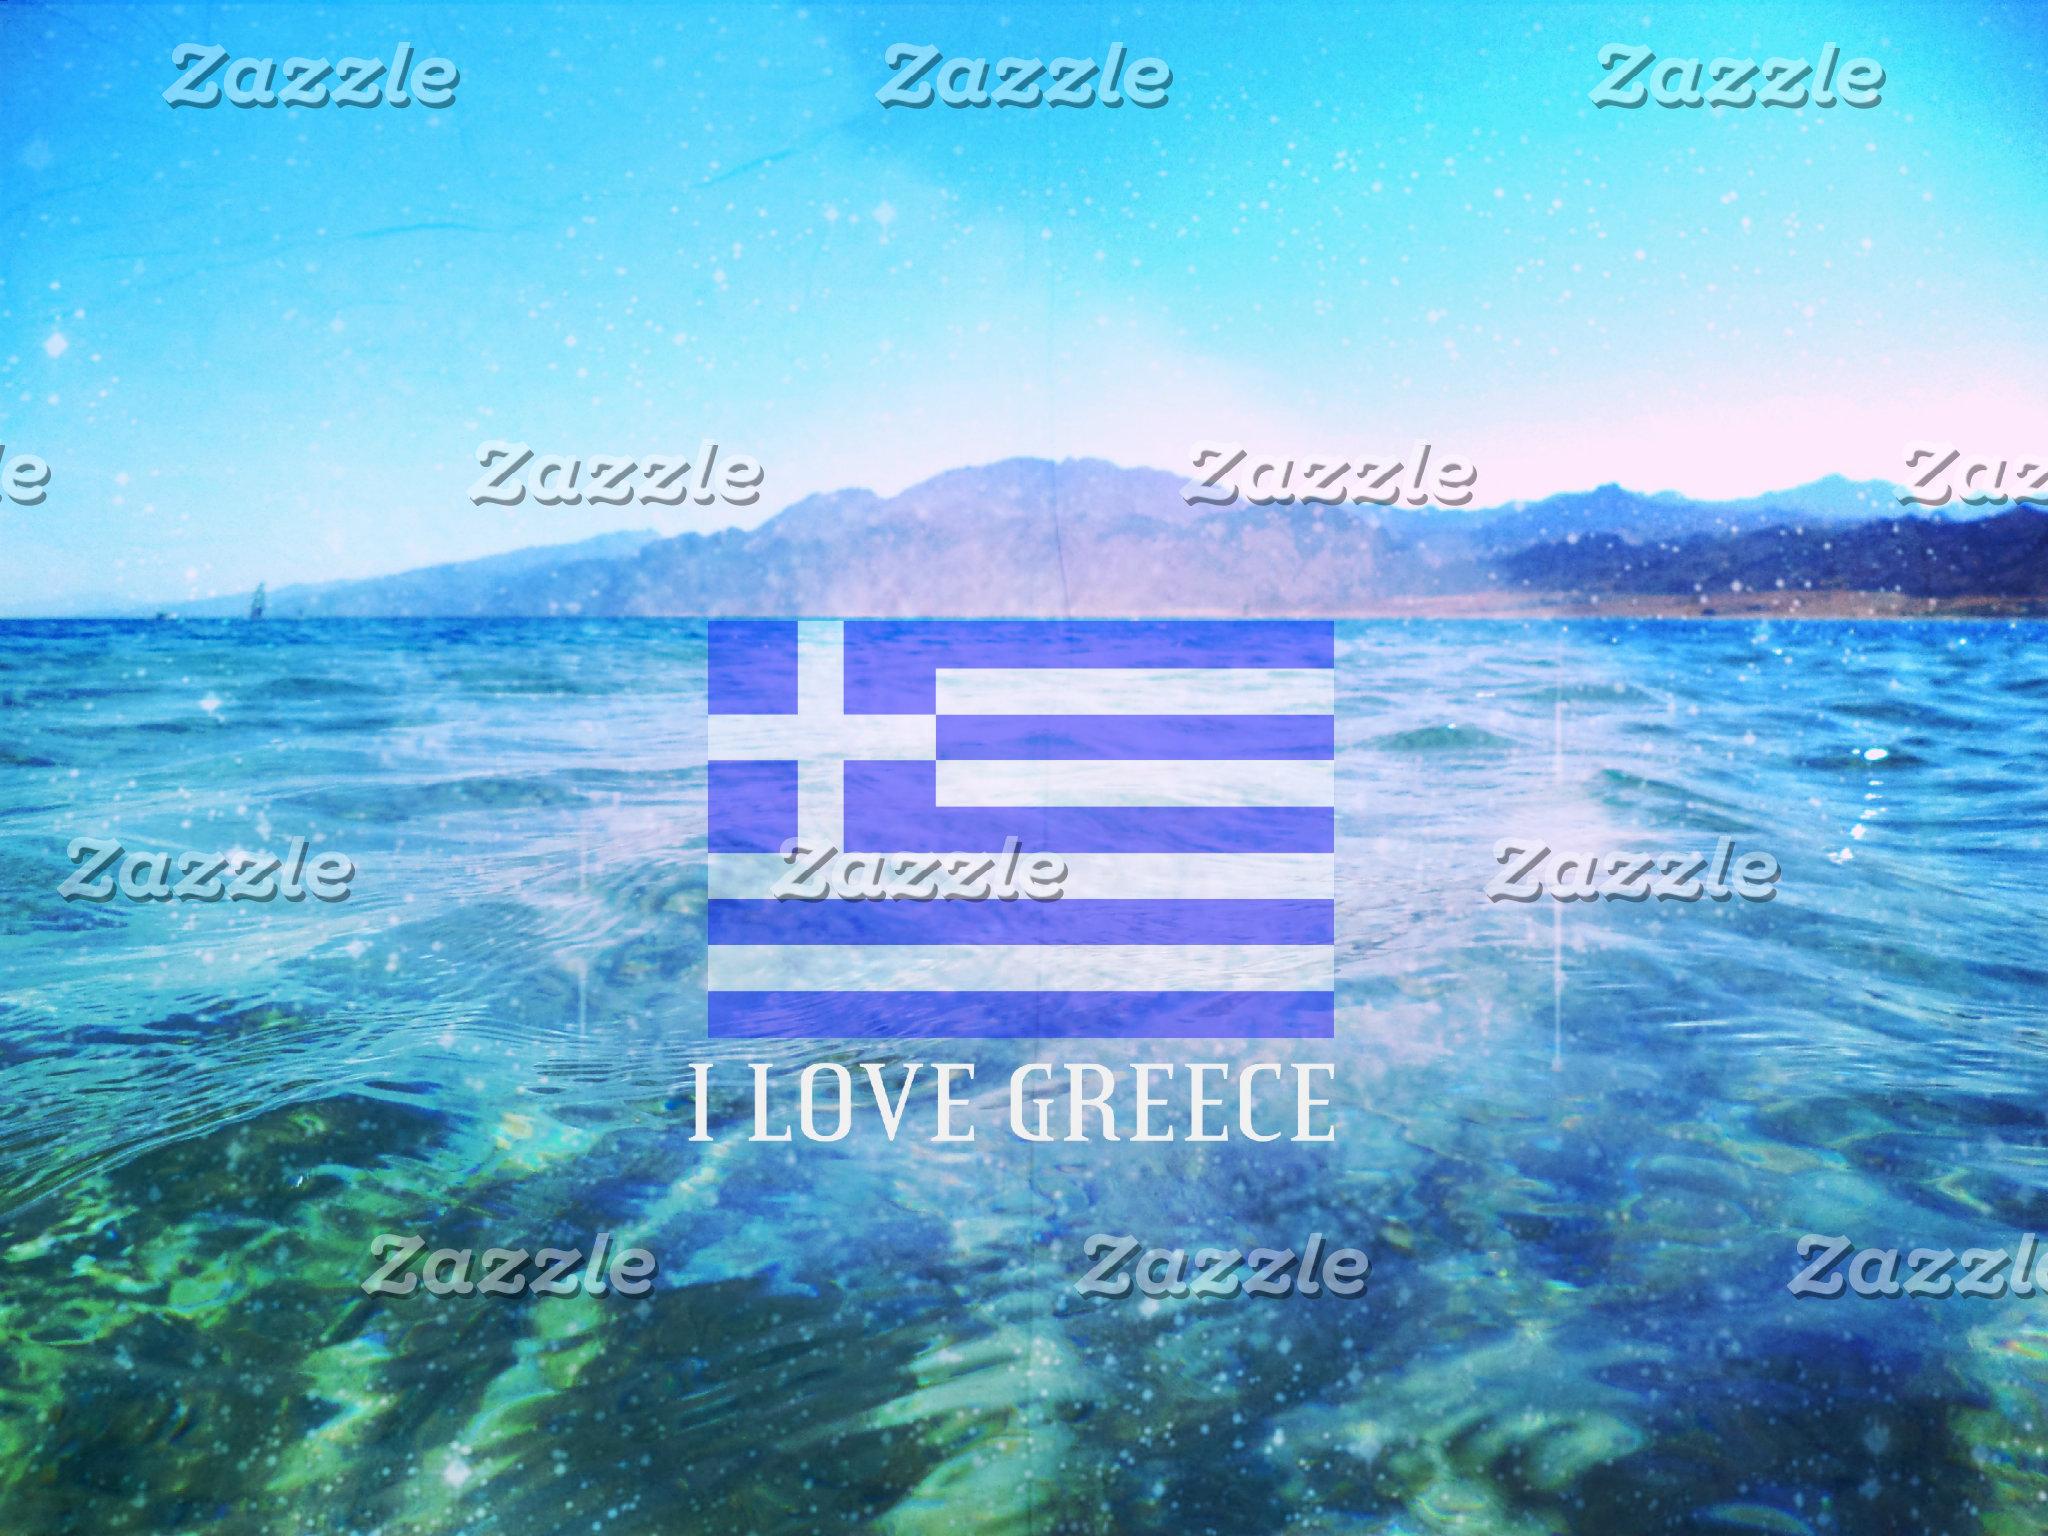 I love Greece